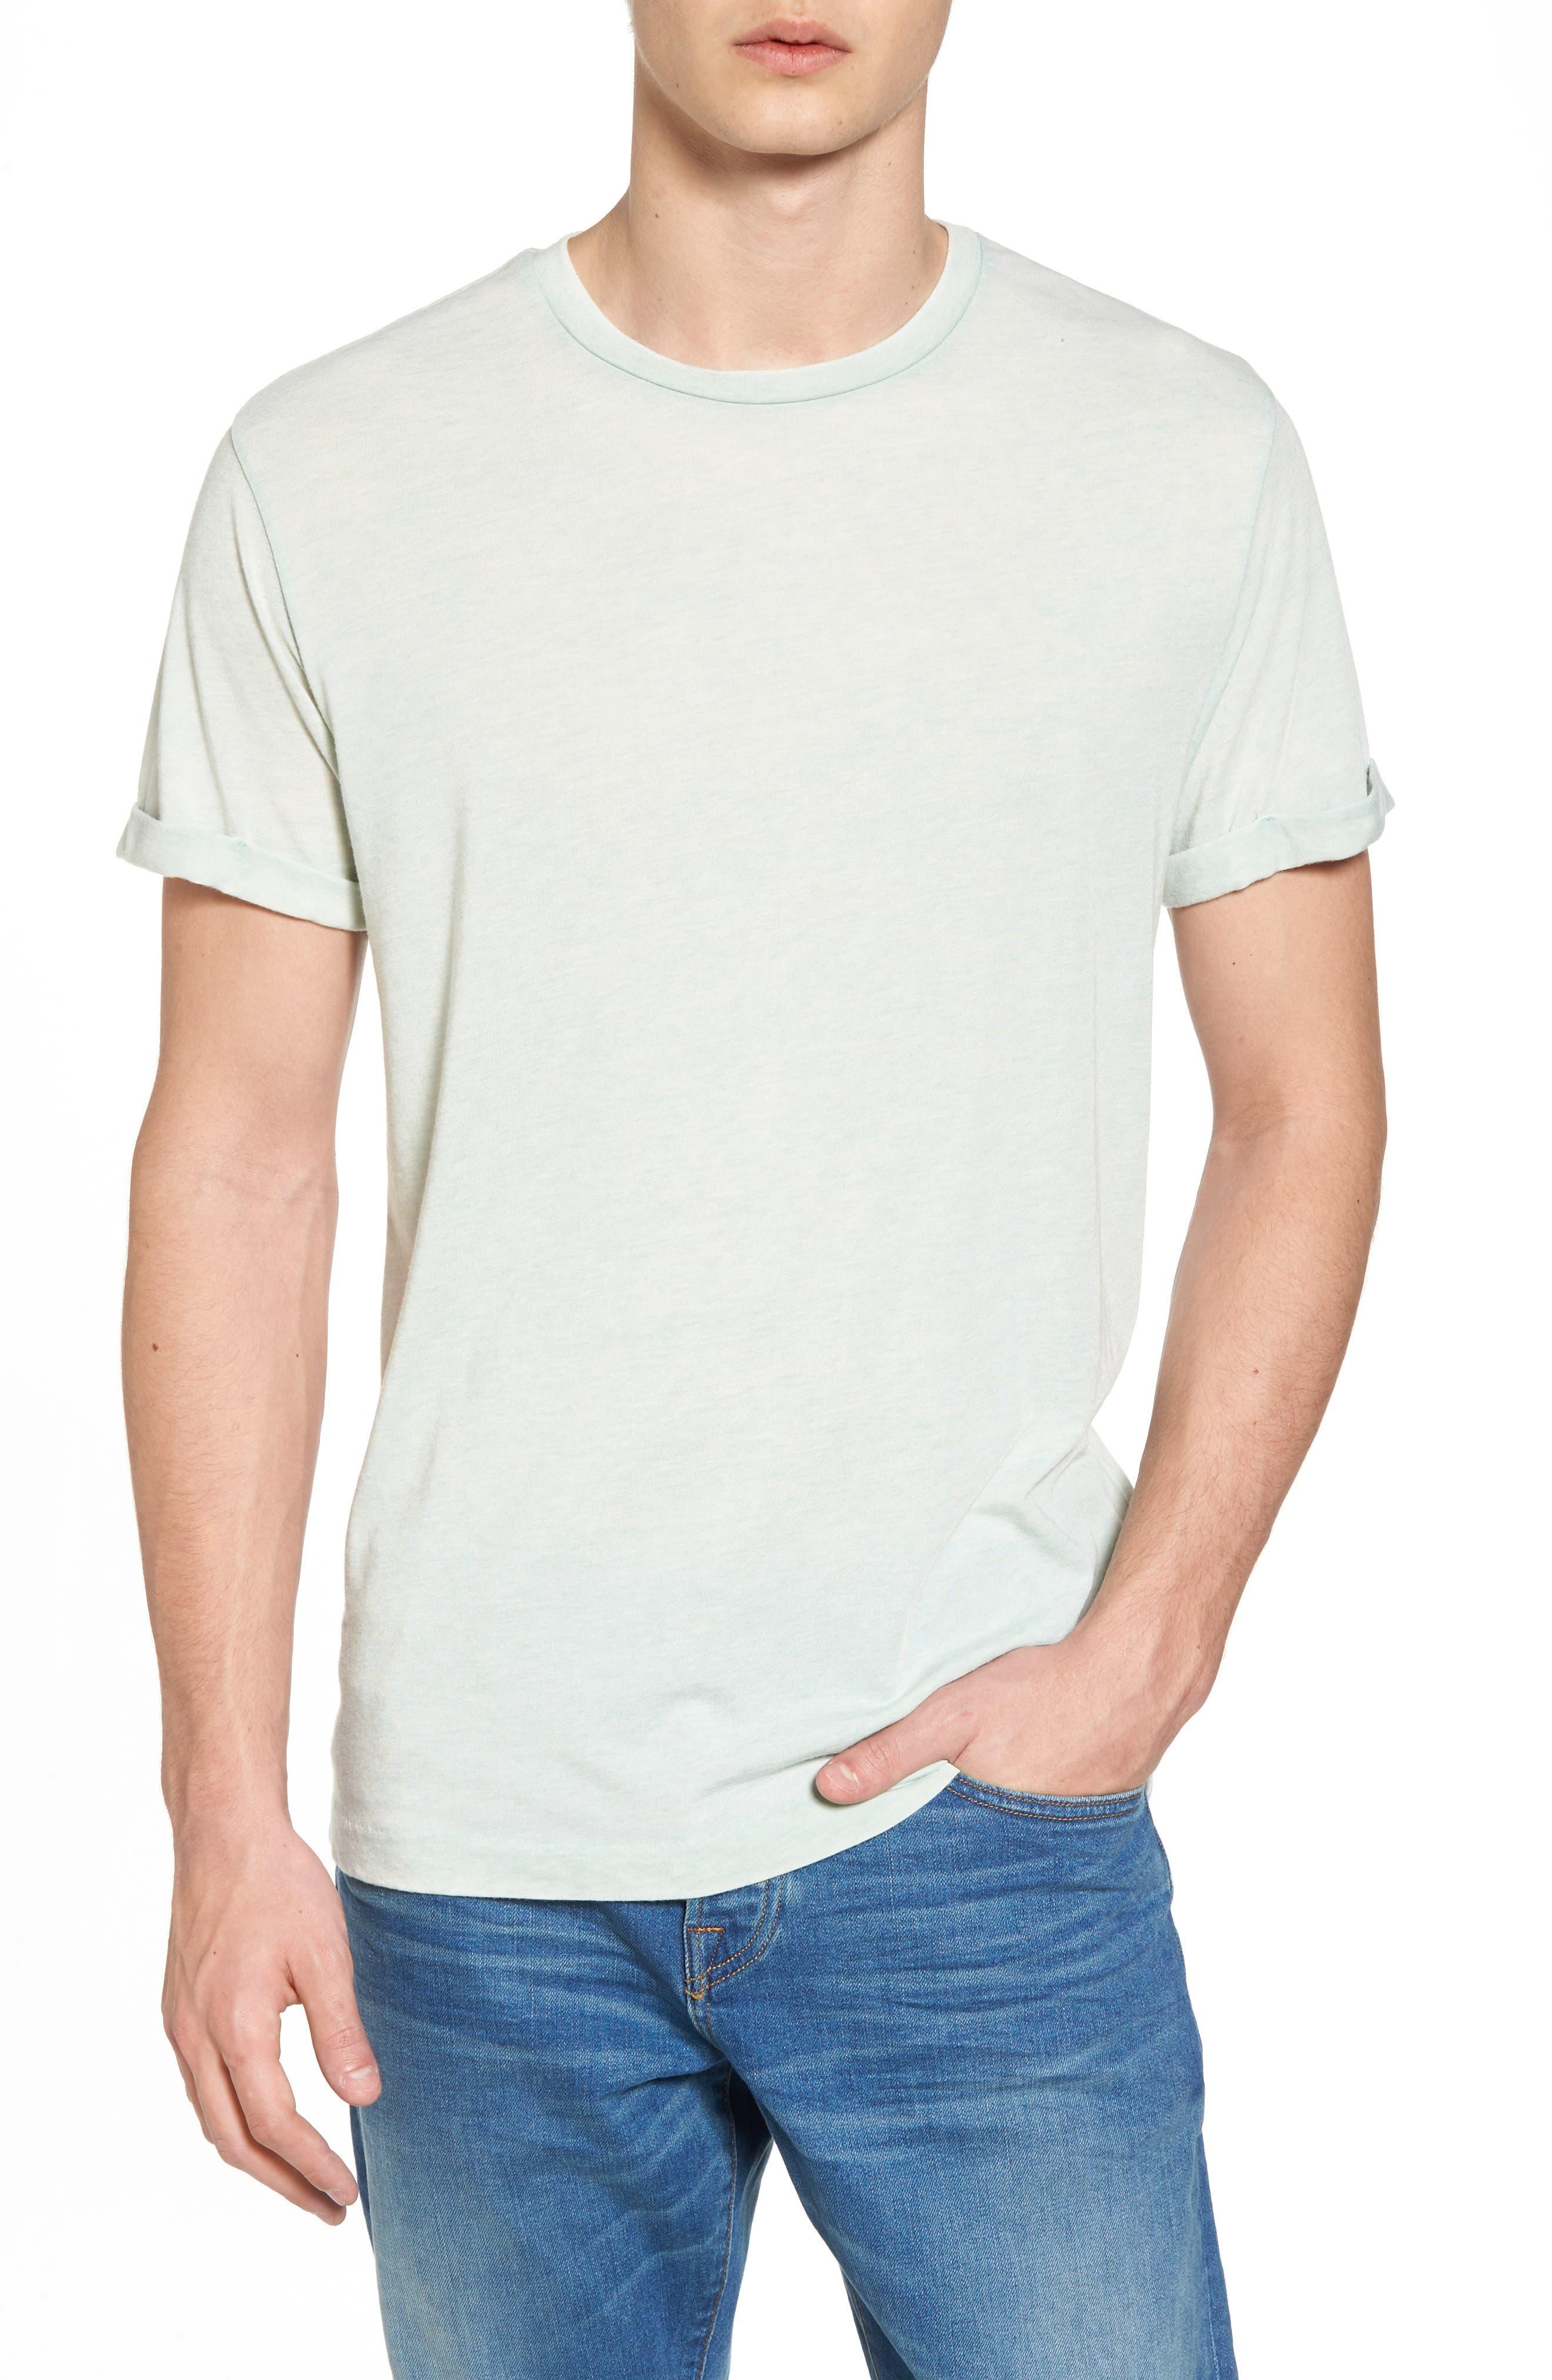 Ausbrenner T-Shirt,                             Main thumbnail 1, color,                             Seafoam Green Melange